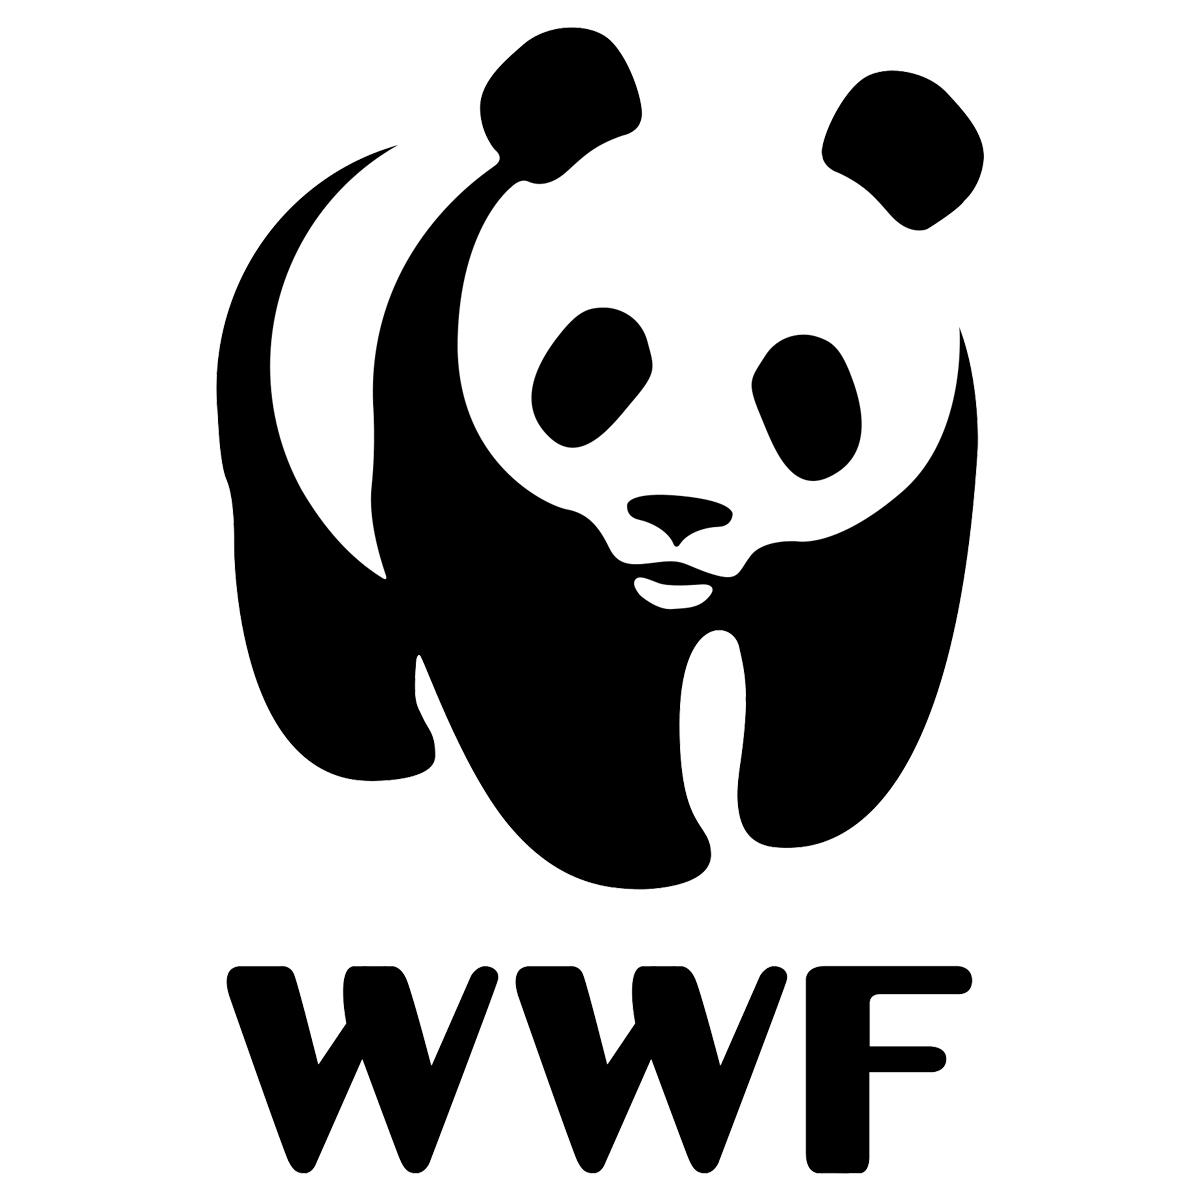 The World Wildlife Federation